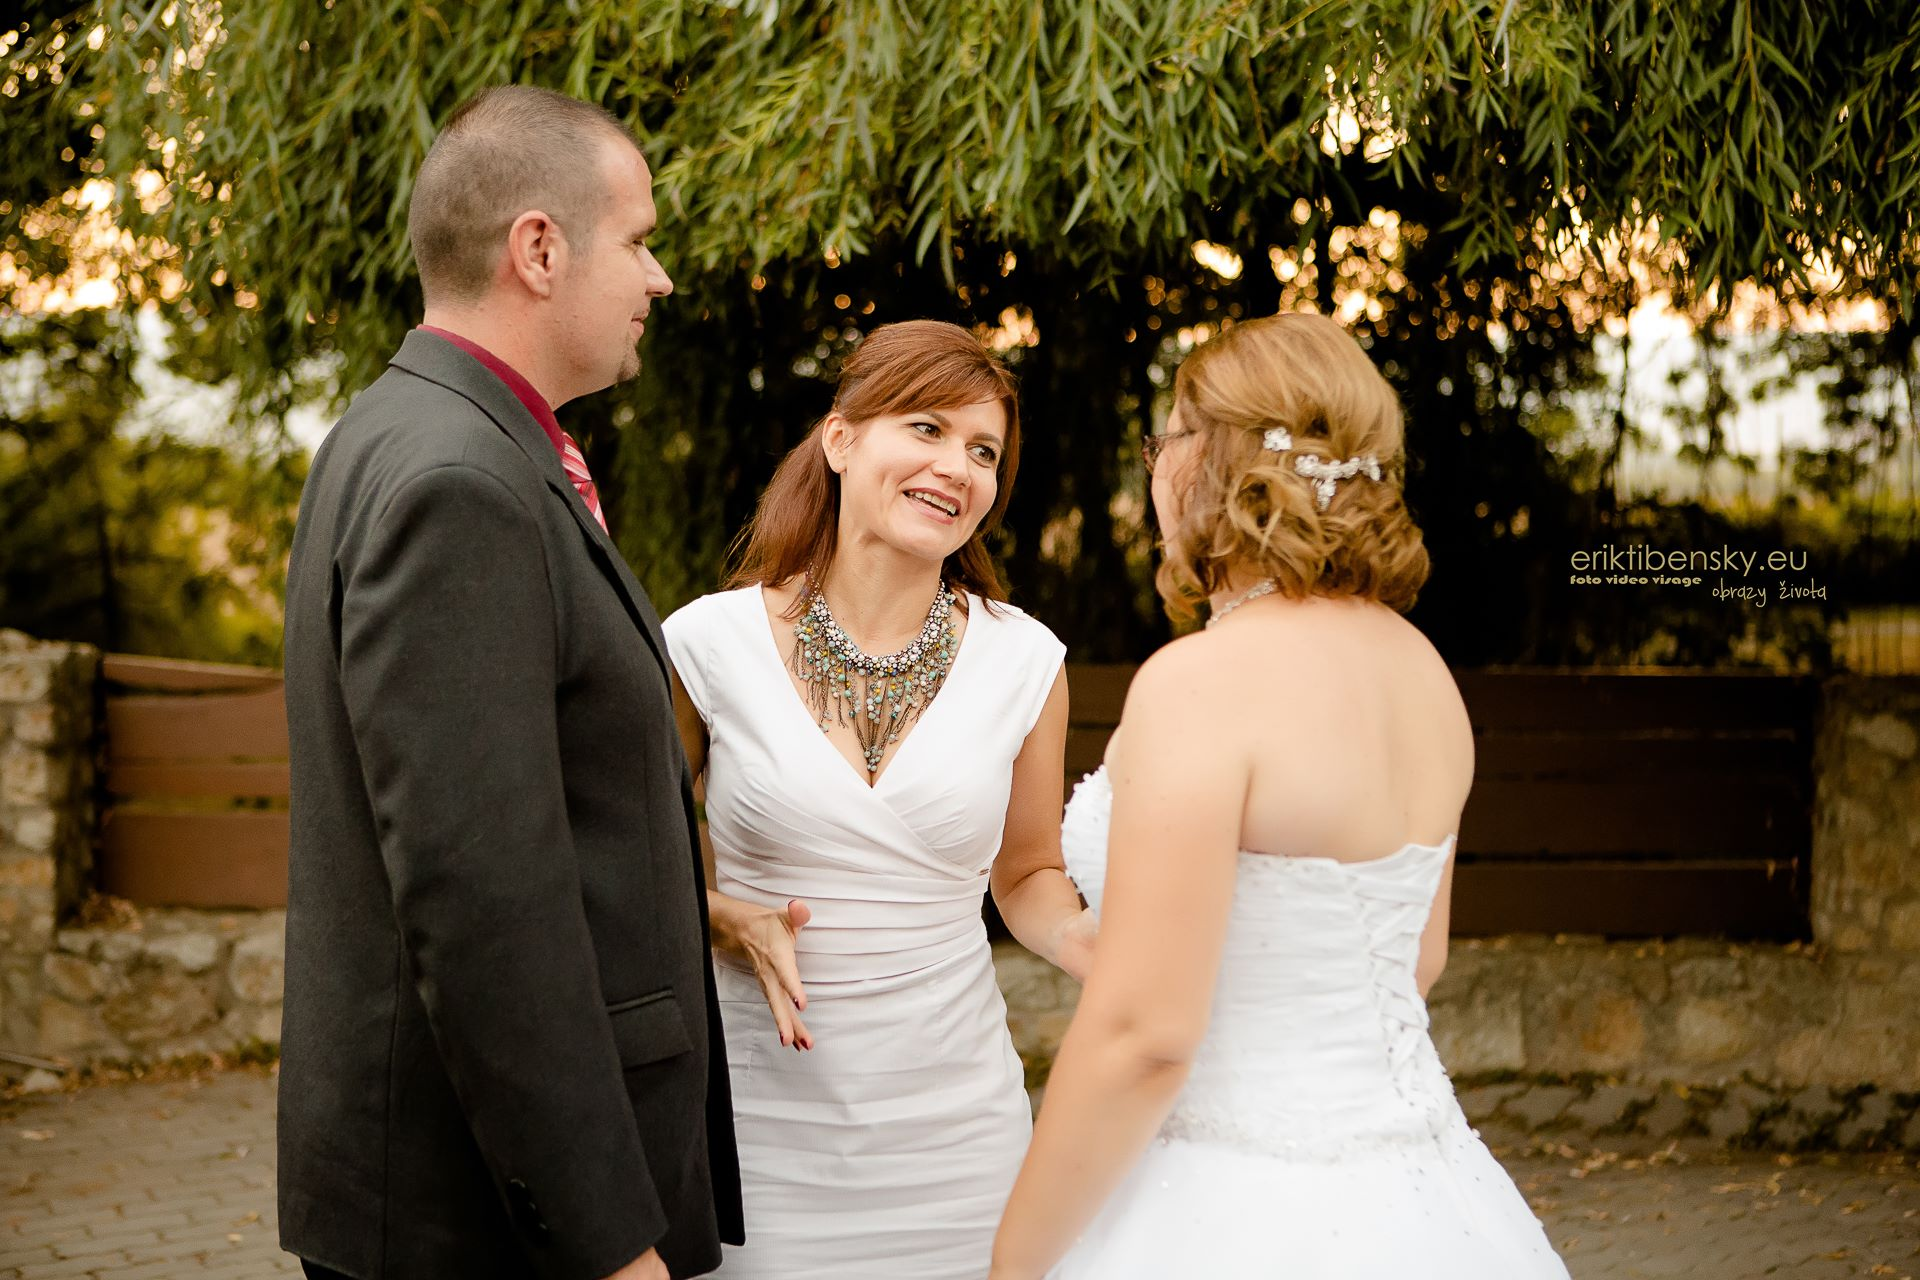 eriktibensky-eu-svadobny-fotograf-wedding-photographer-3051